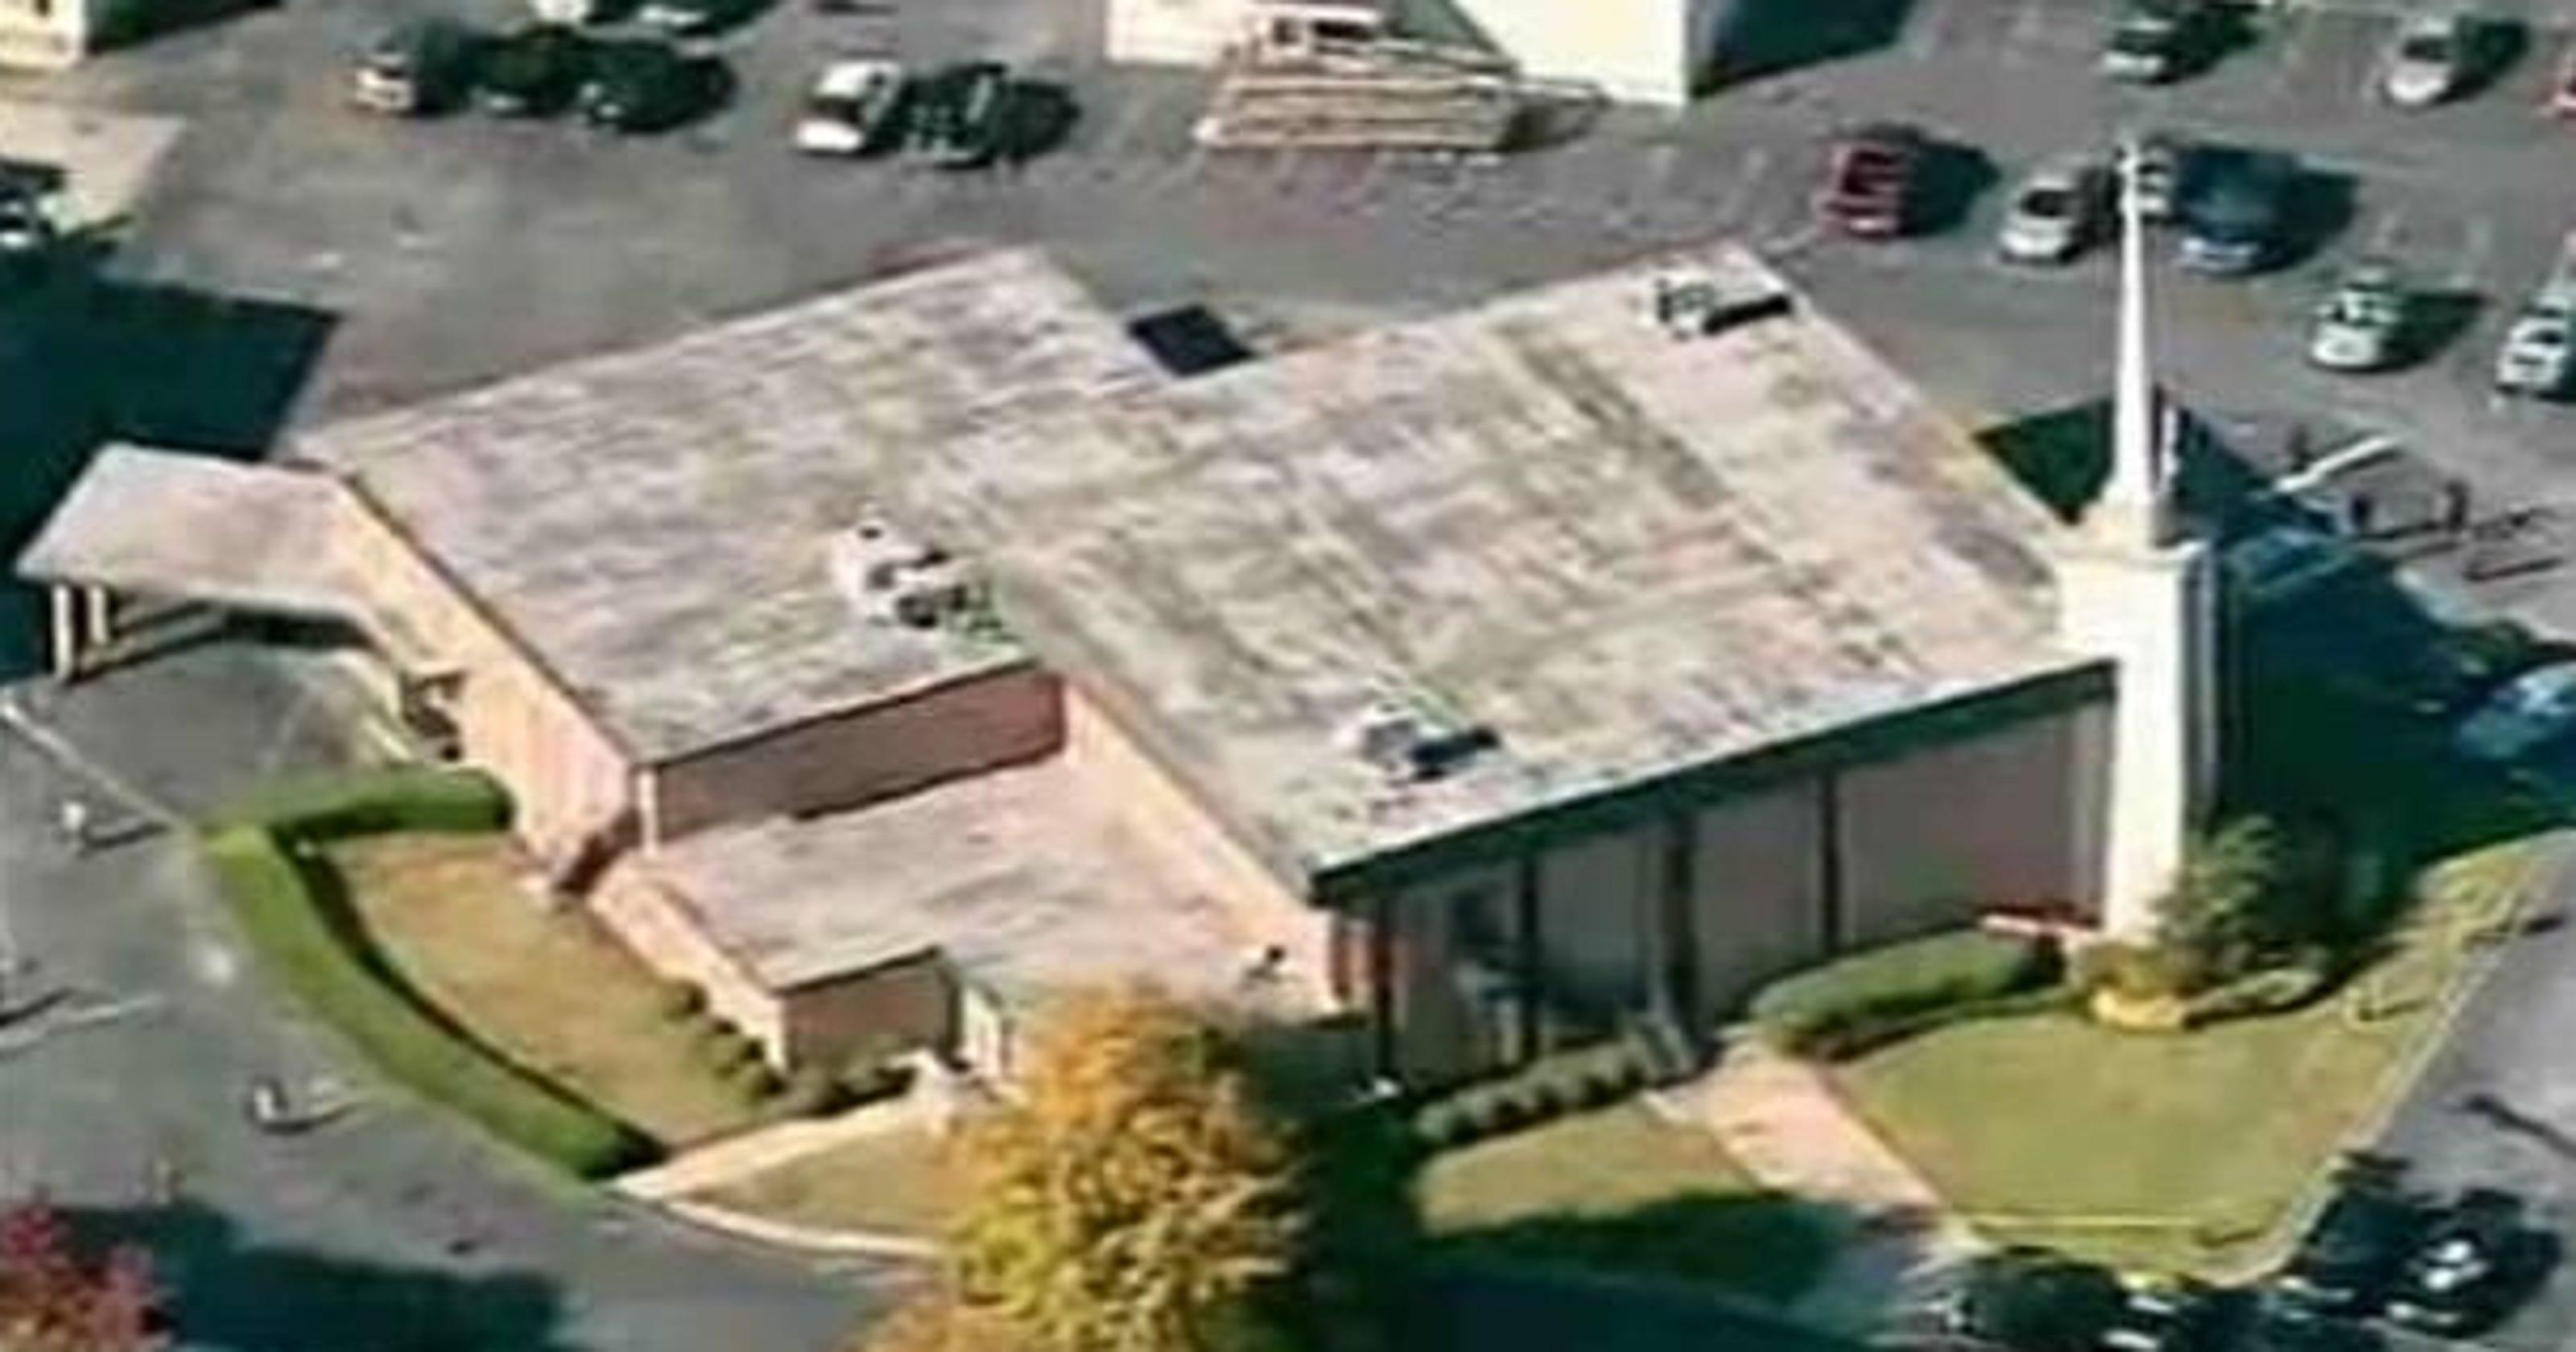 Prayer leader slain at Creflo Dollar's Ga  church